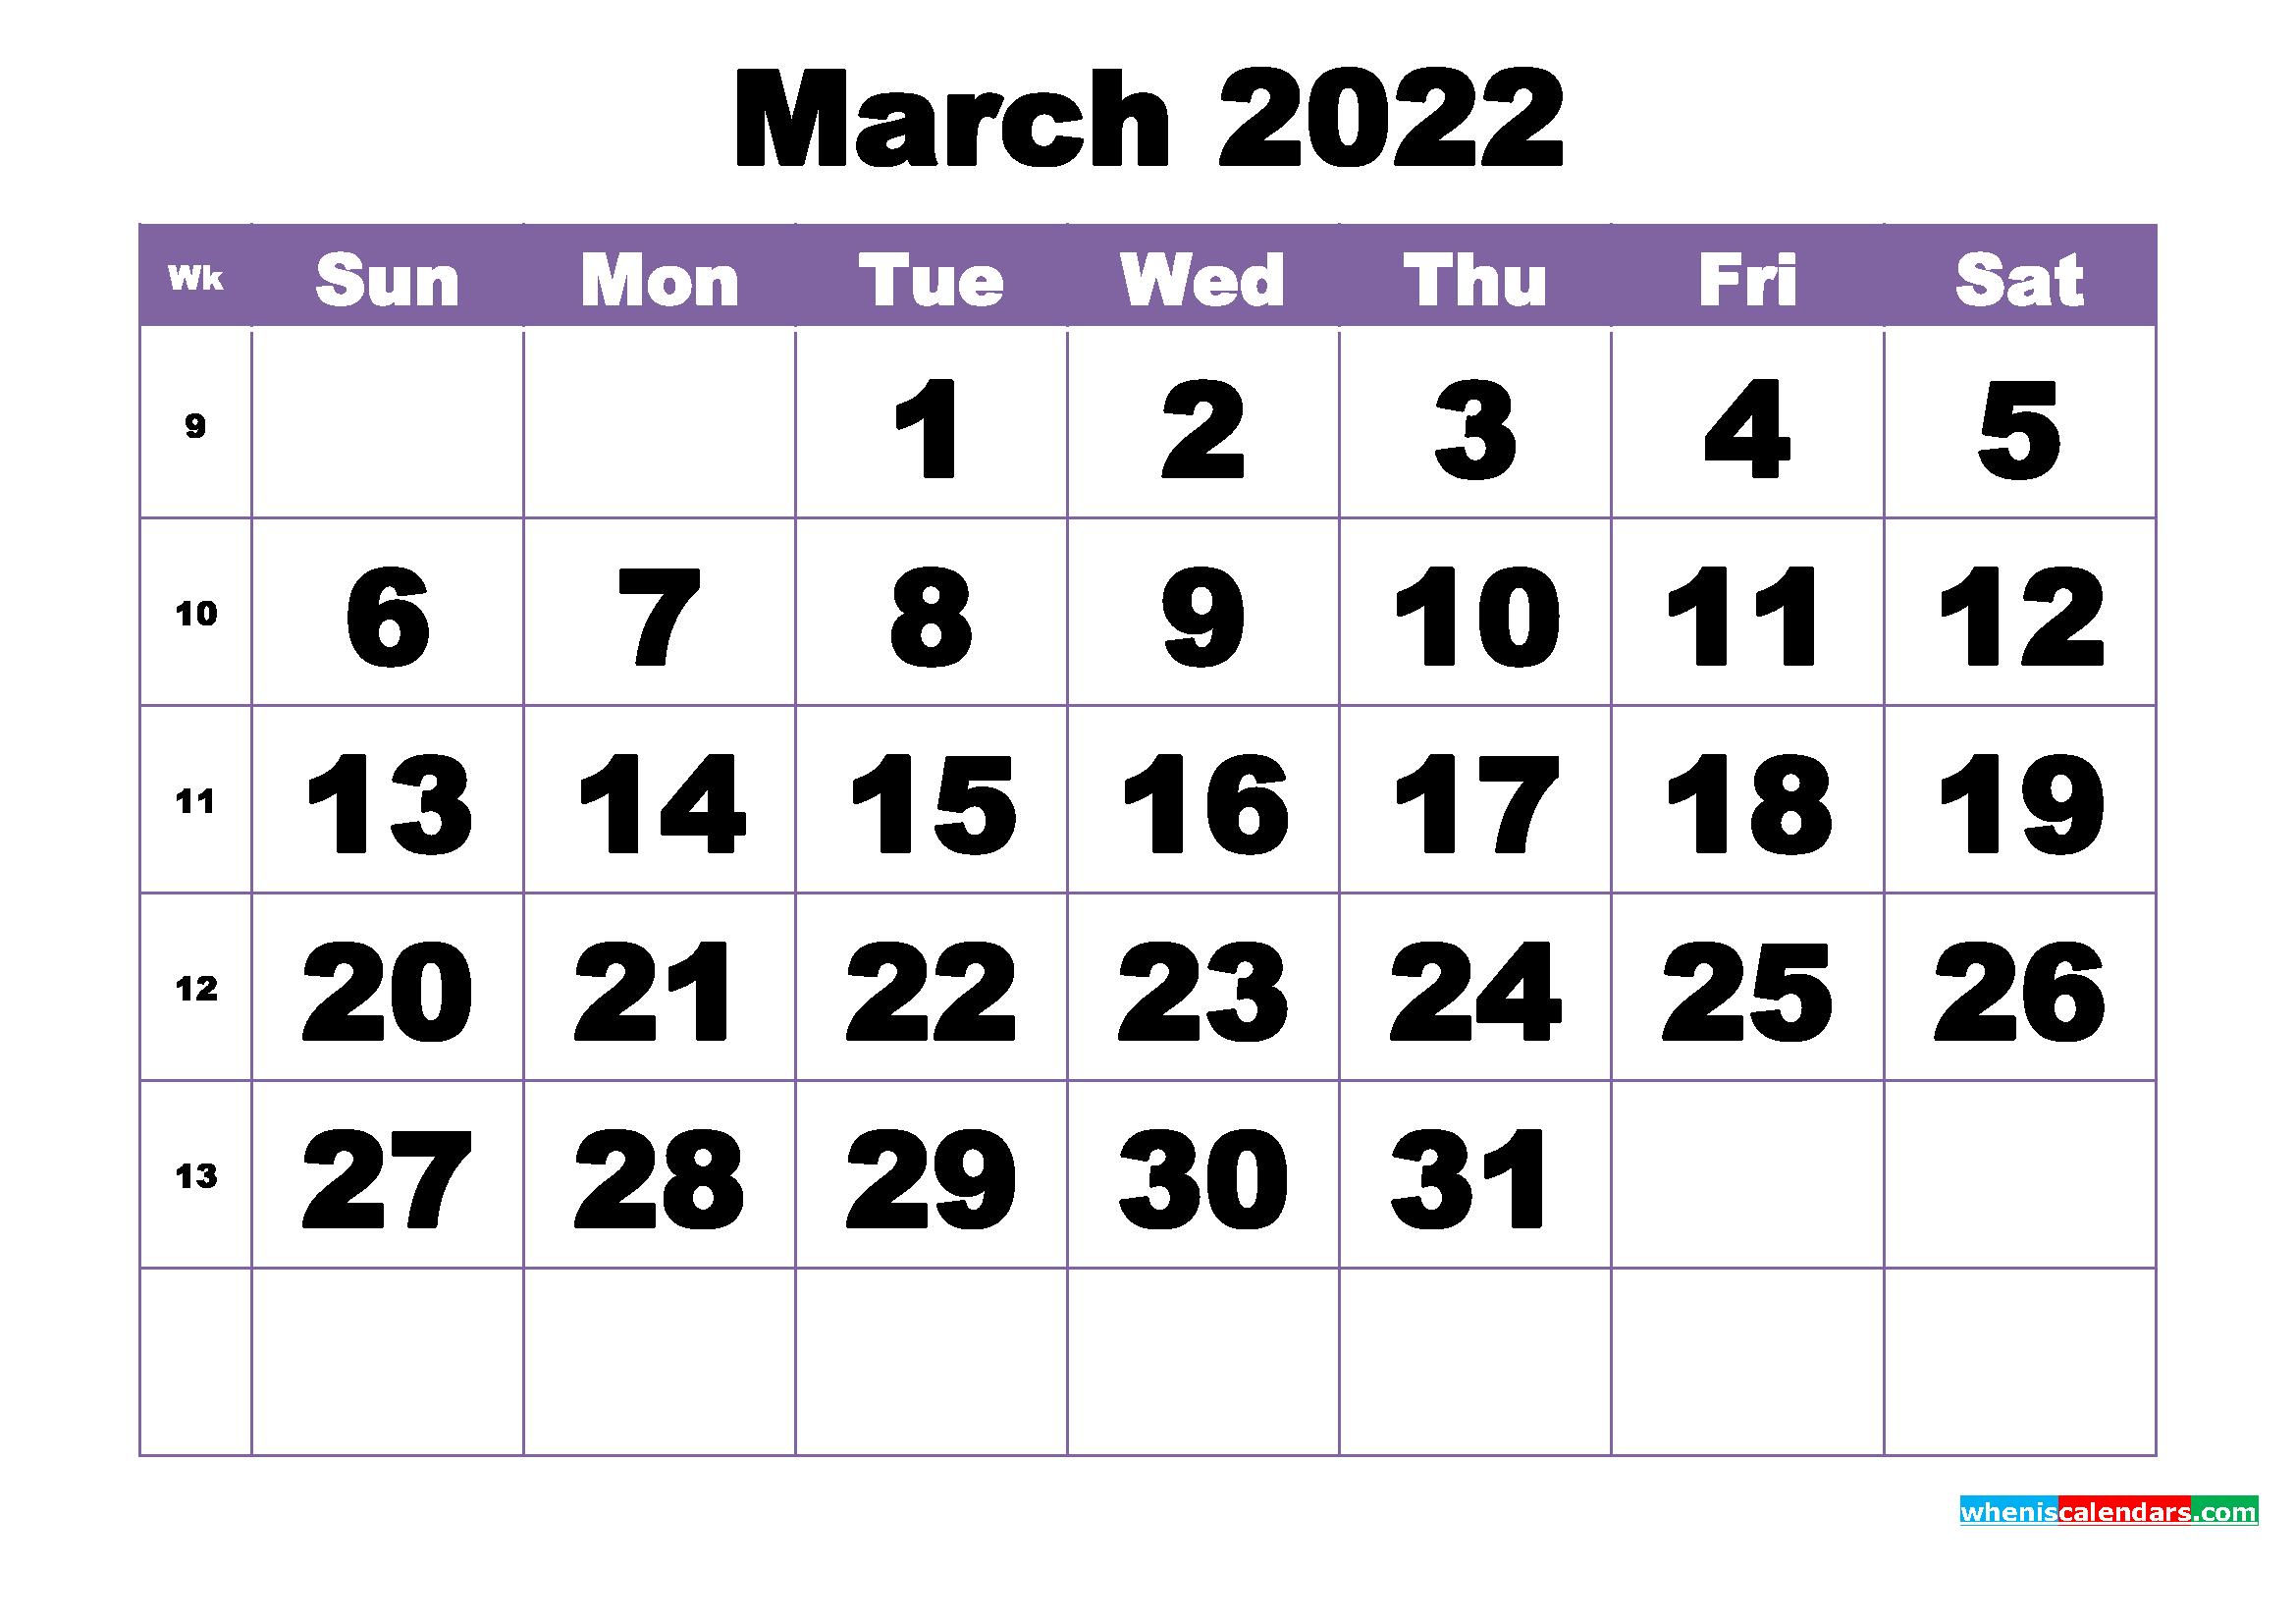 March 2022 Printable Calendar Template - Free Printable ...